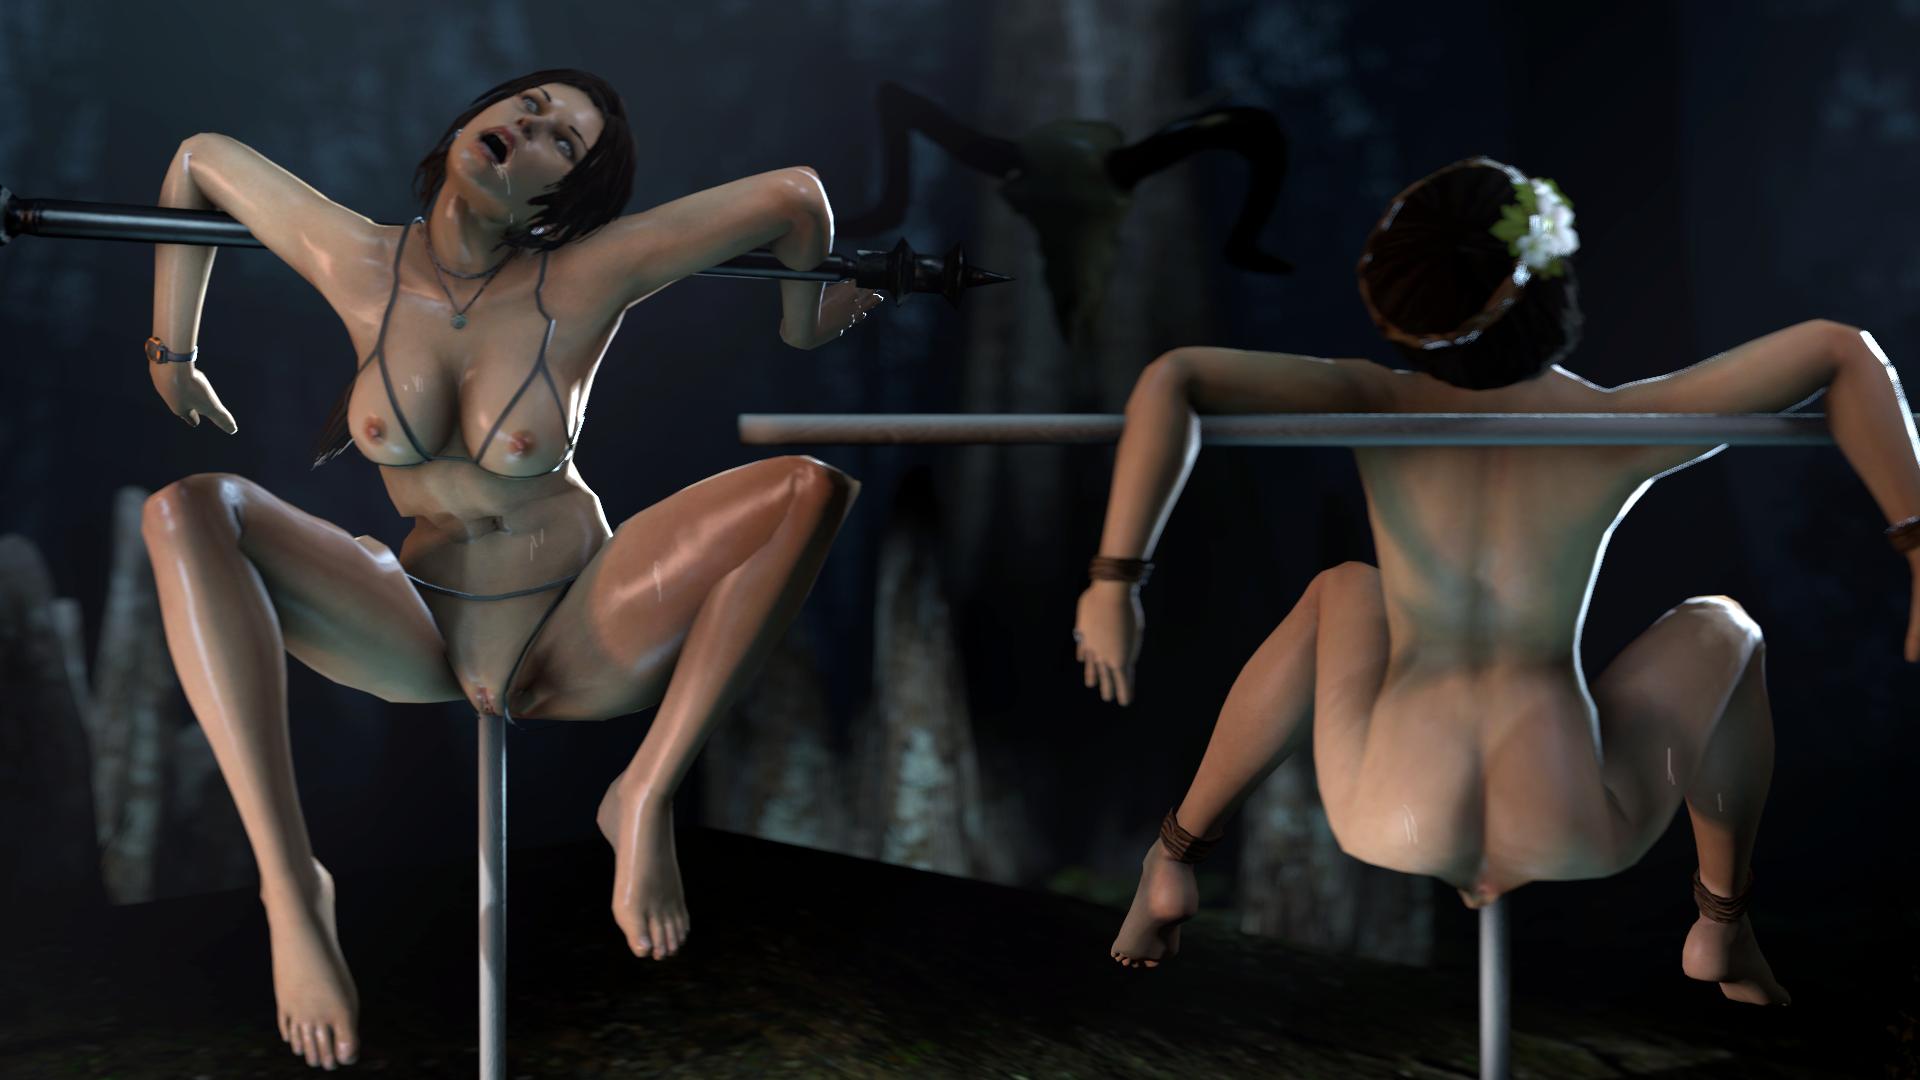 Lara croft fakes porn xxx